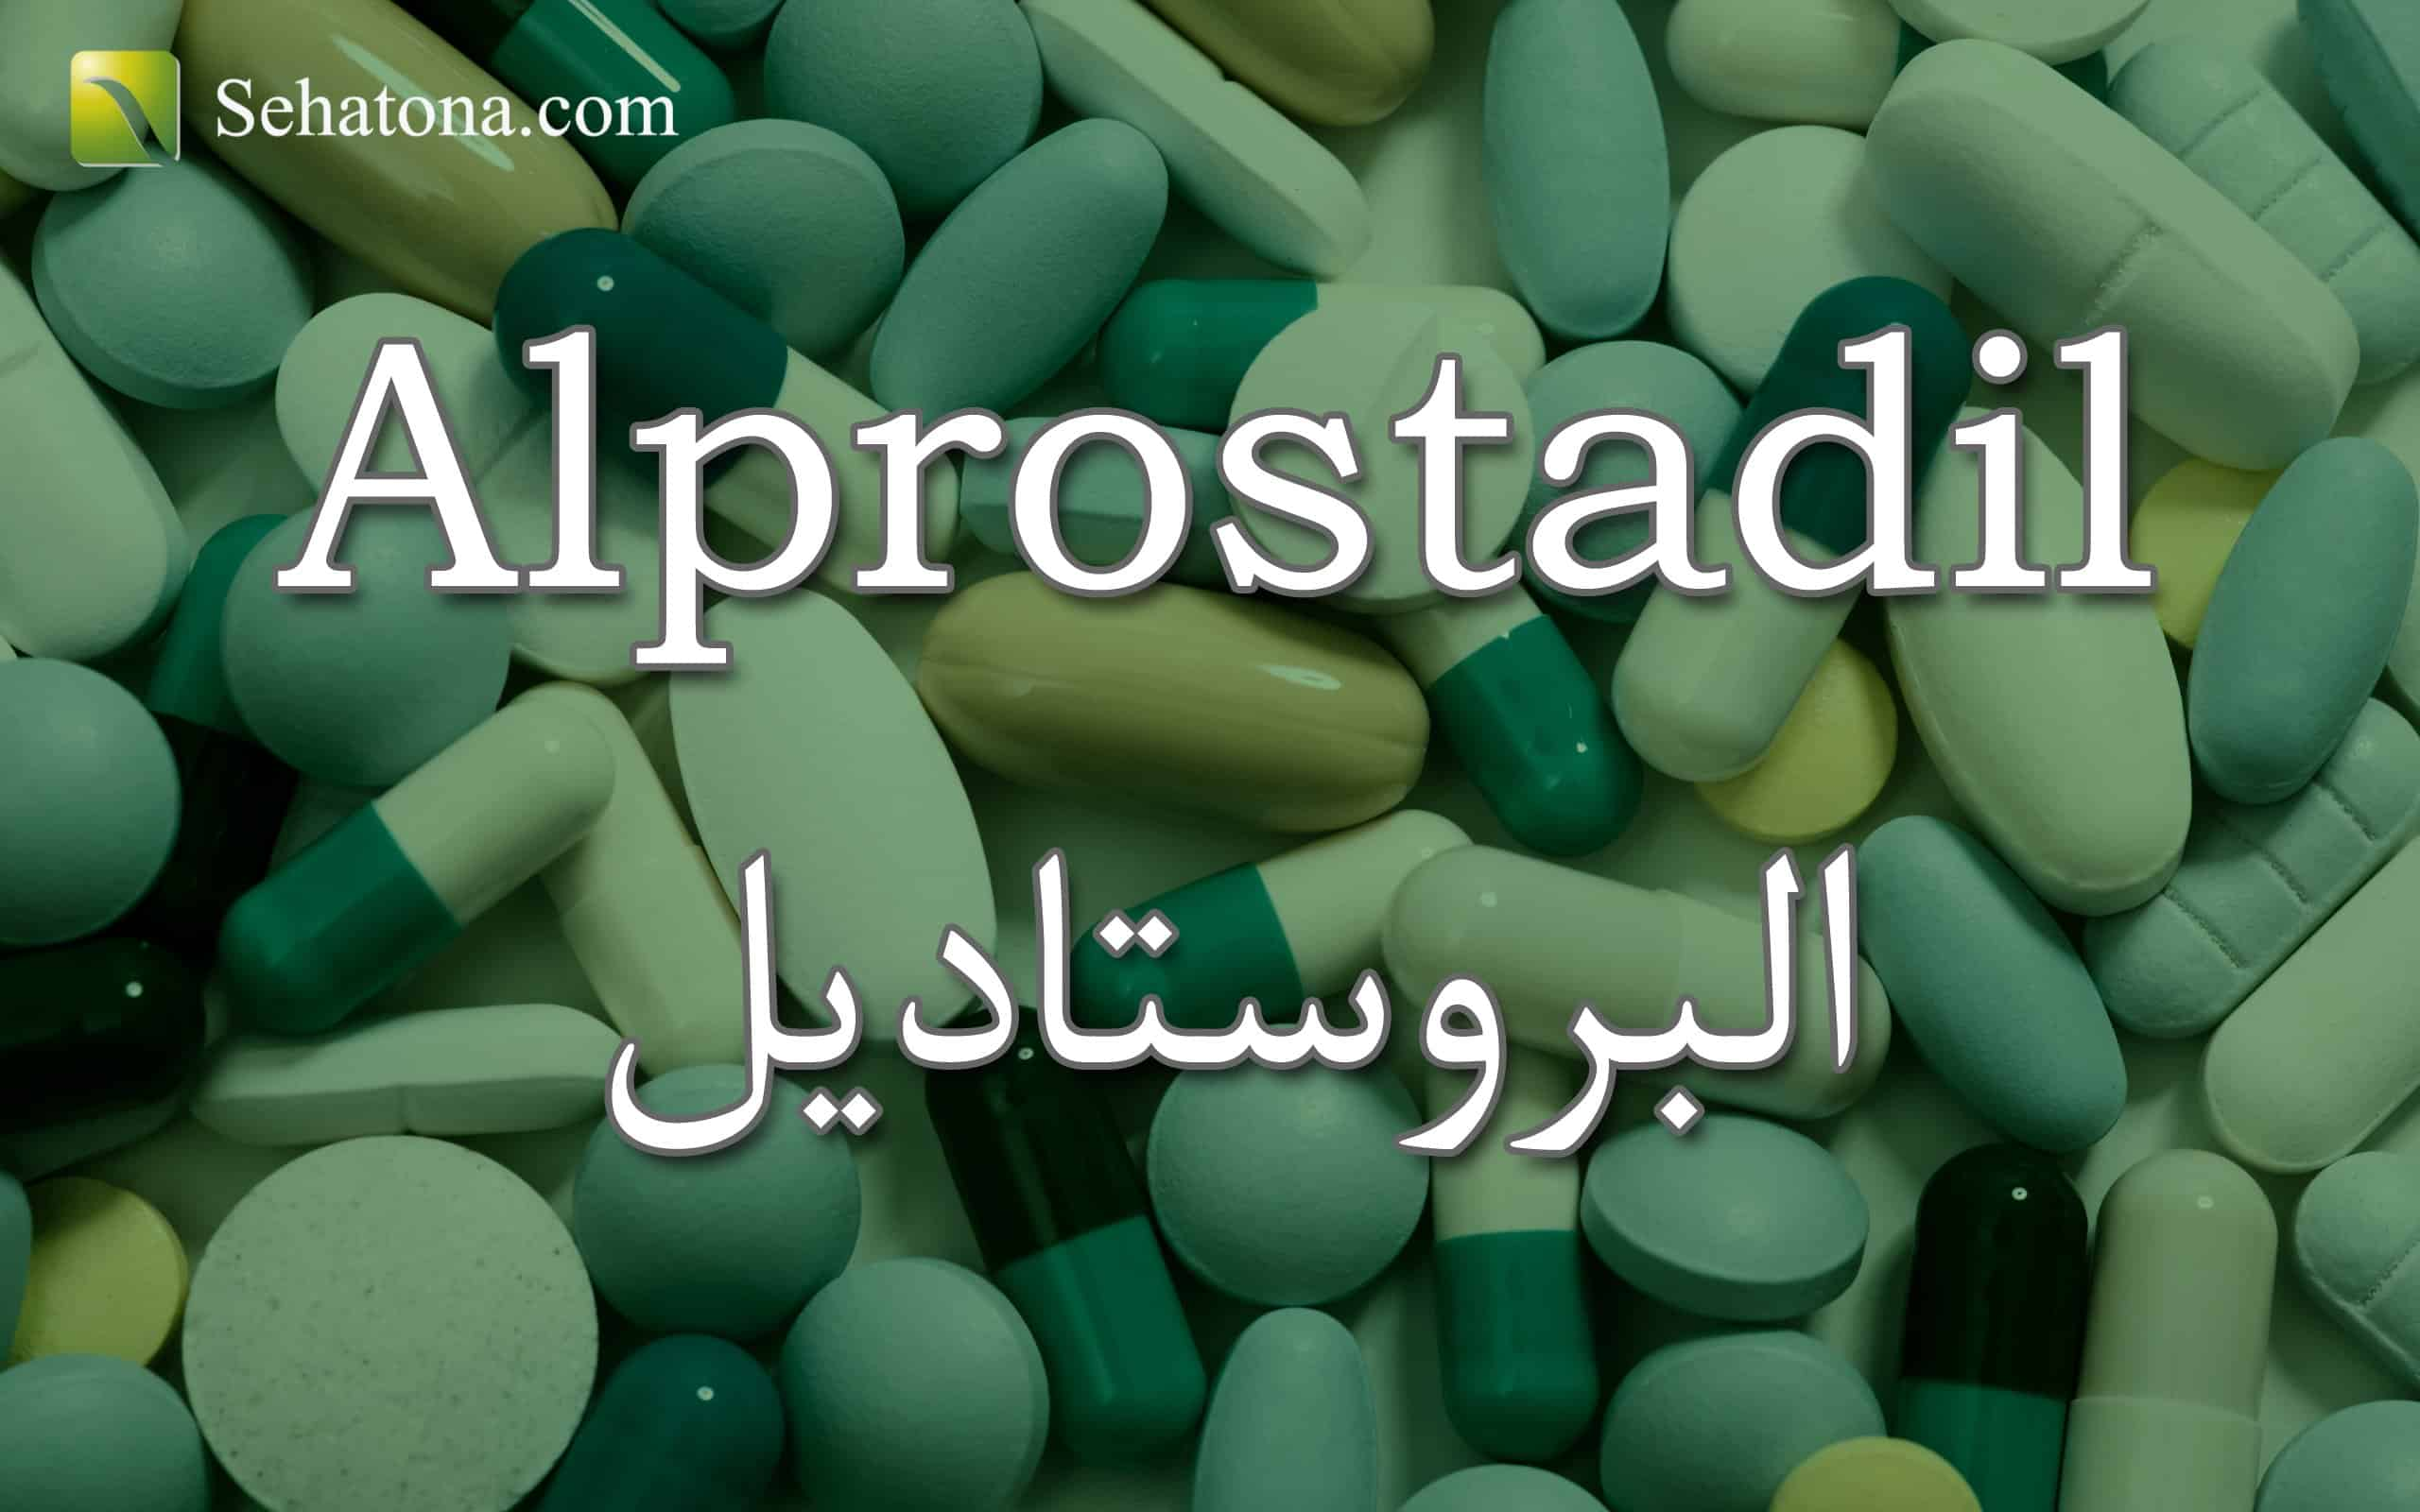 Alprostadil